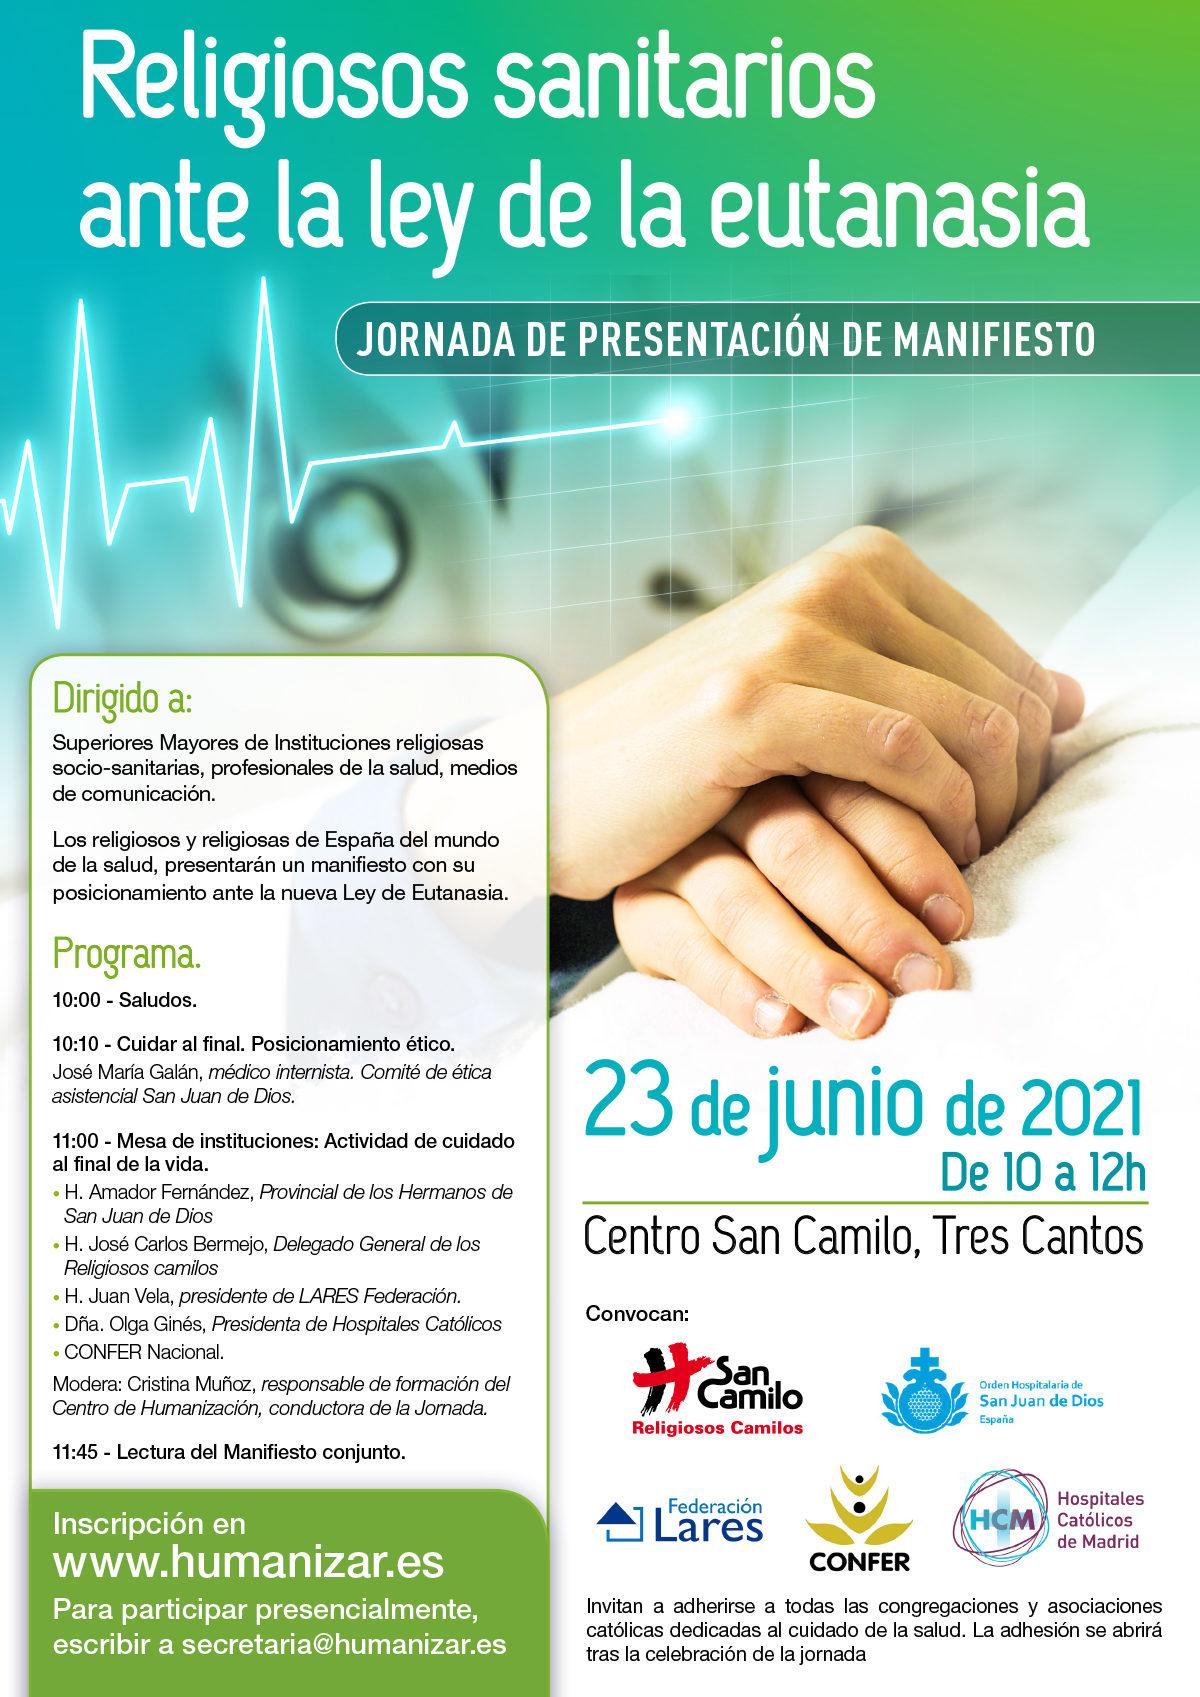 Religiosos sanitarios de España ante la eutanasia